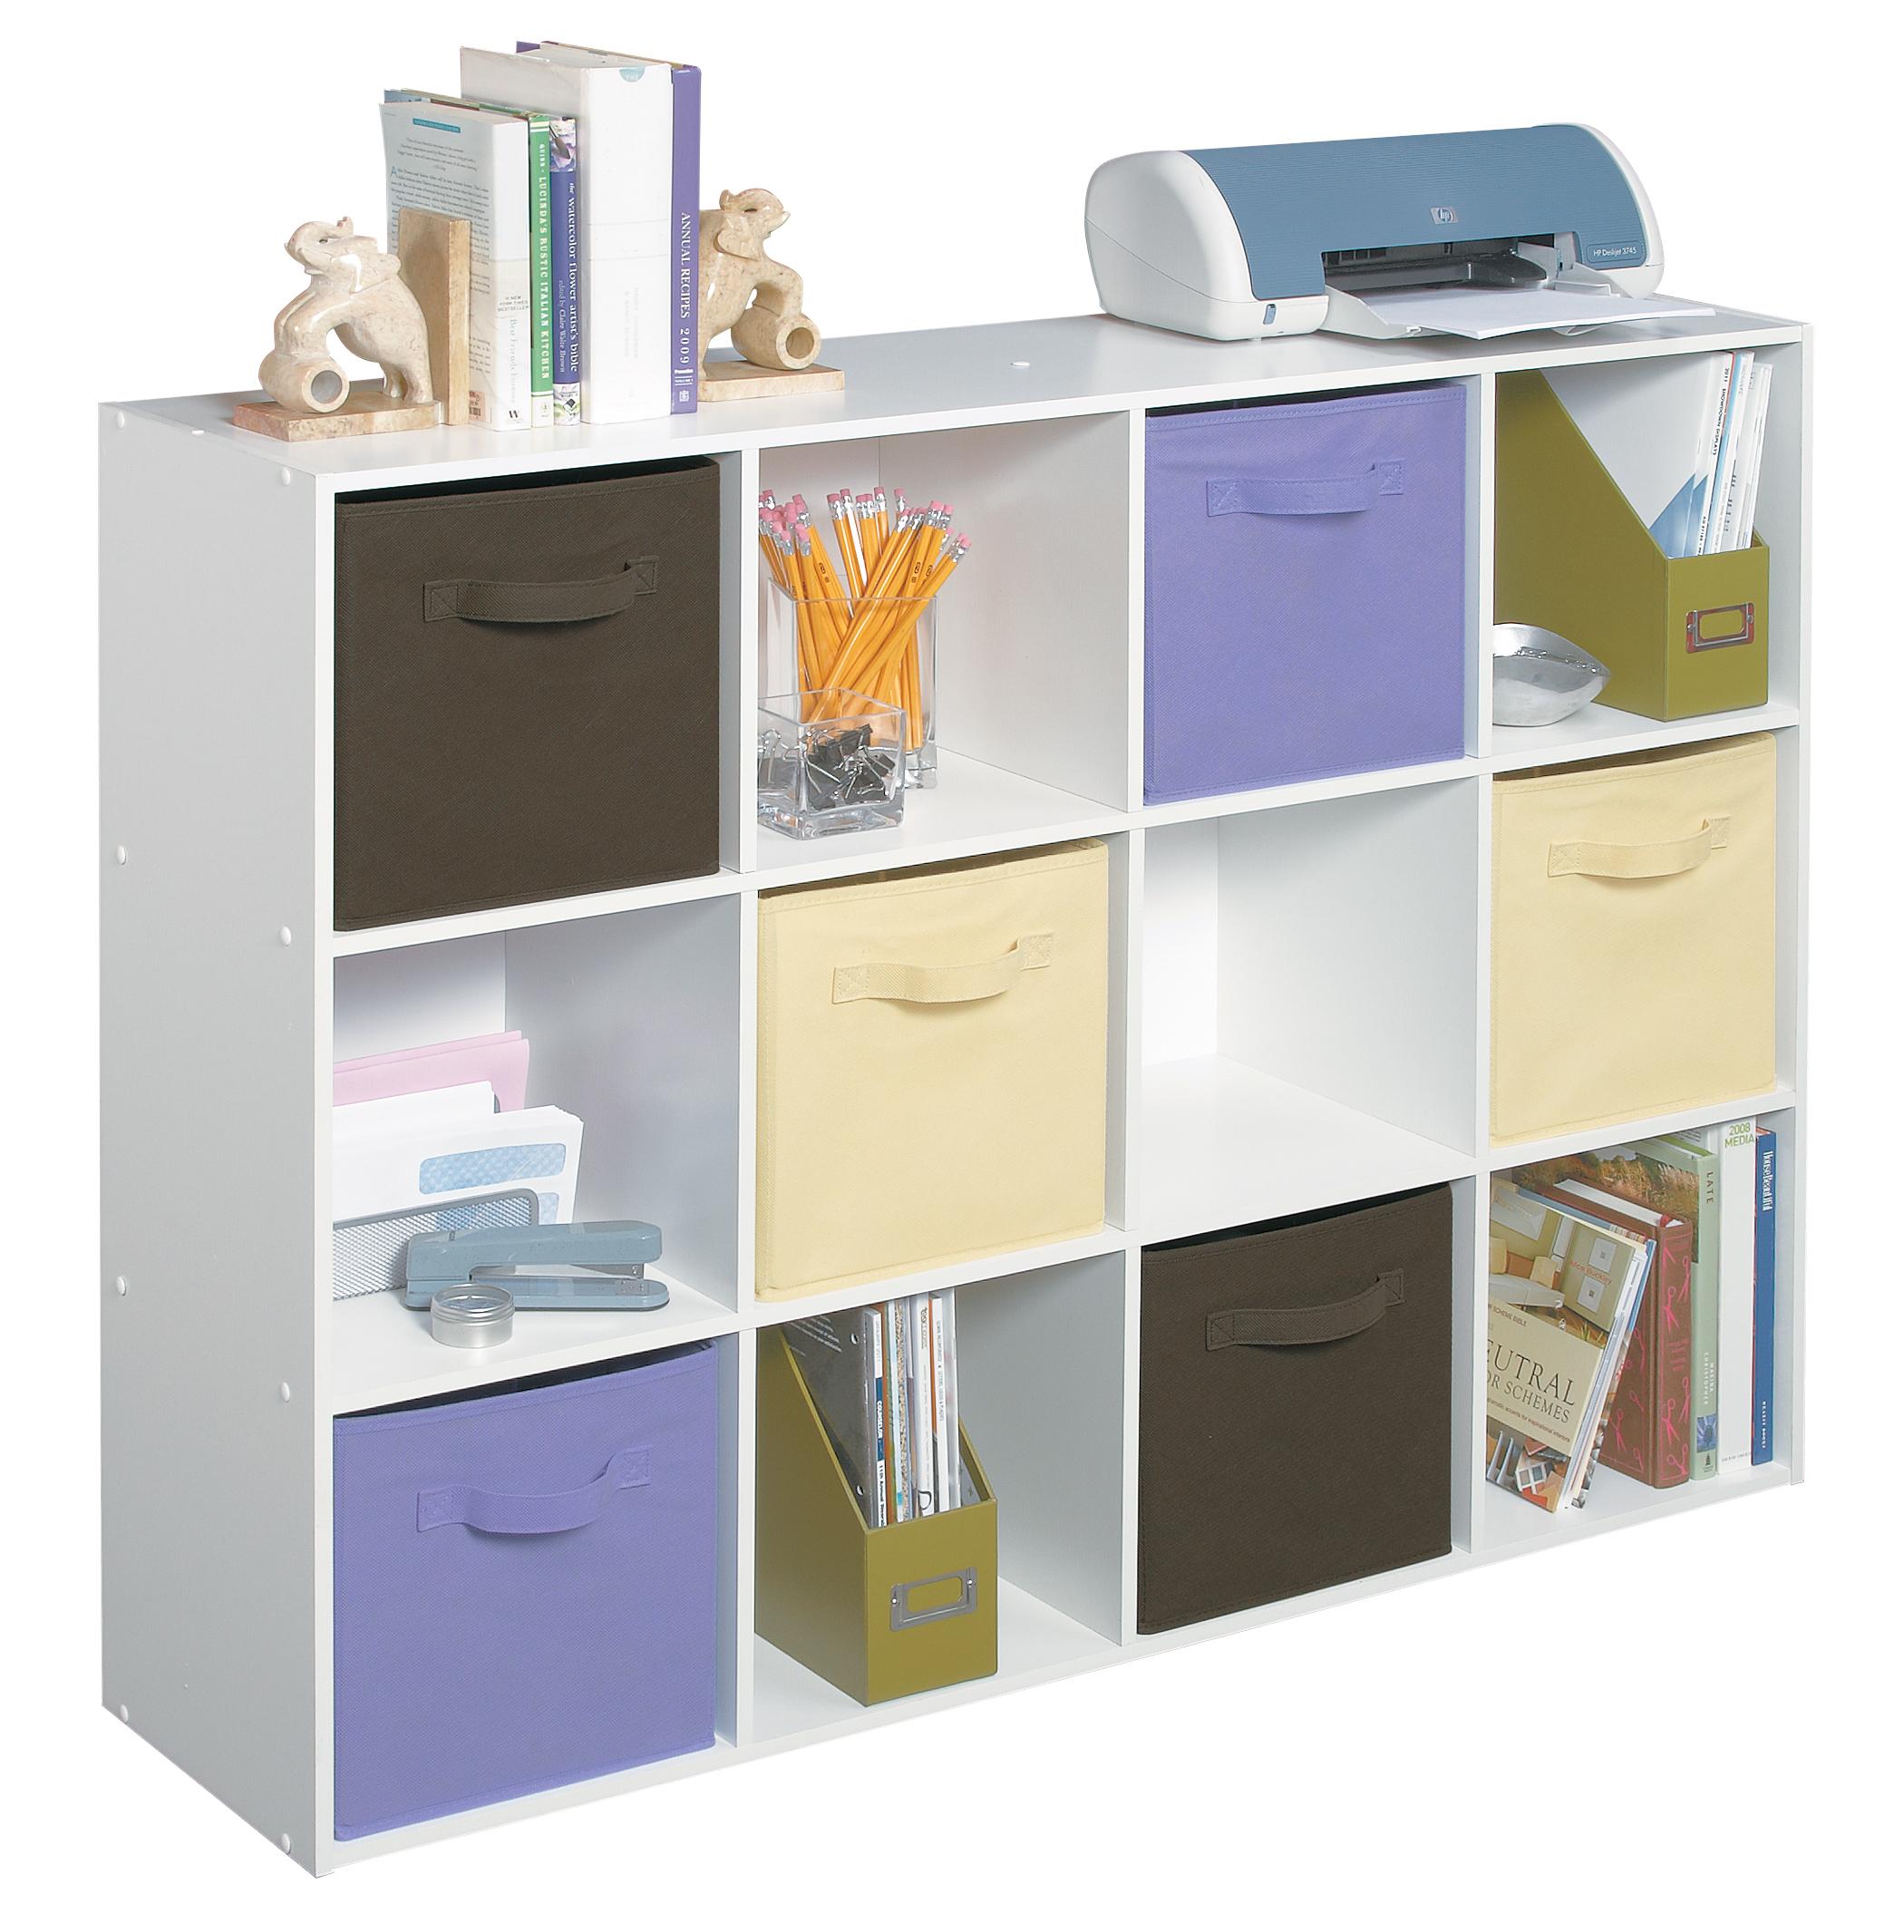 closetmaid cubeicals 12 cube organizer ebay. Black Bedroom Furniture Sets. Home Design Ideas